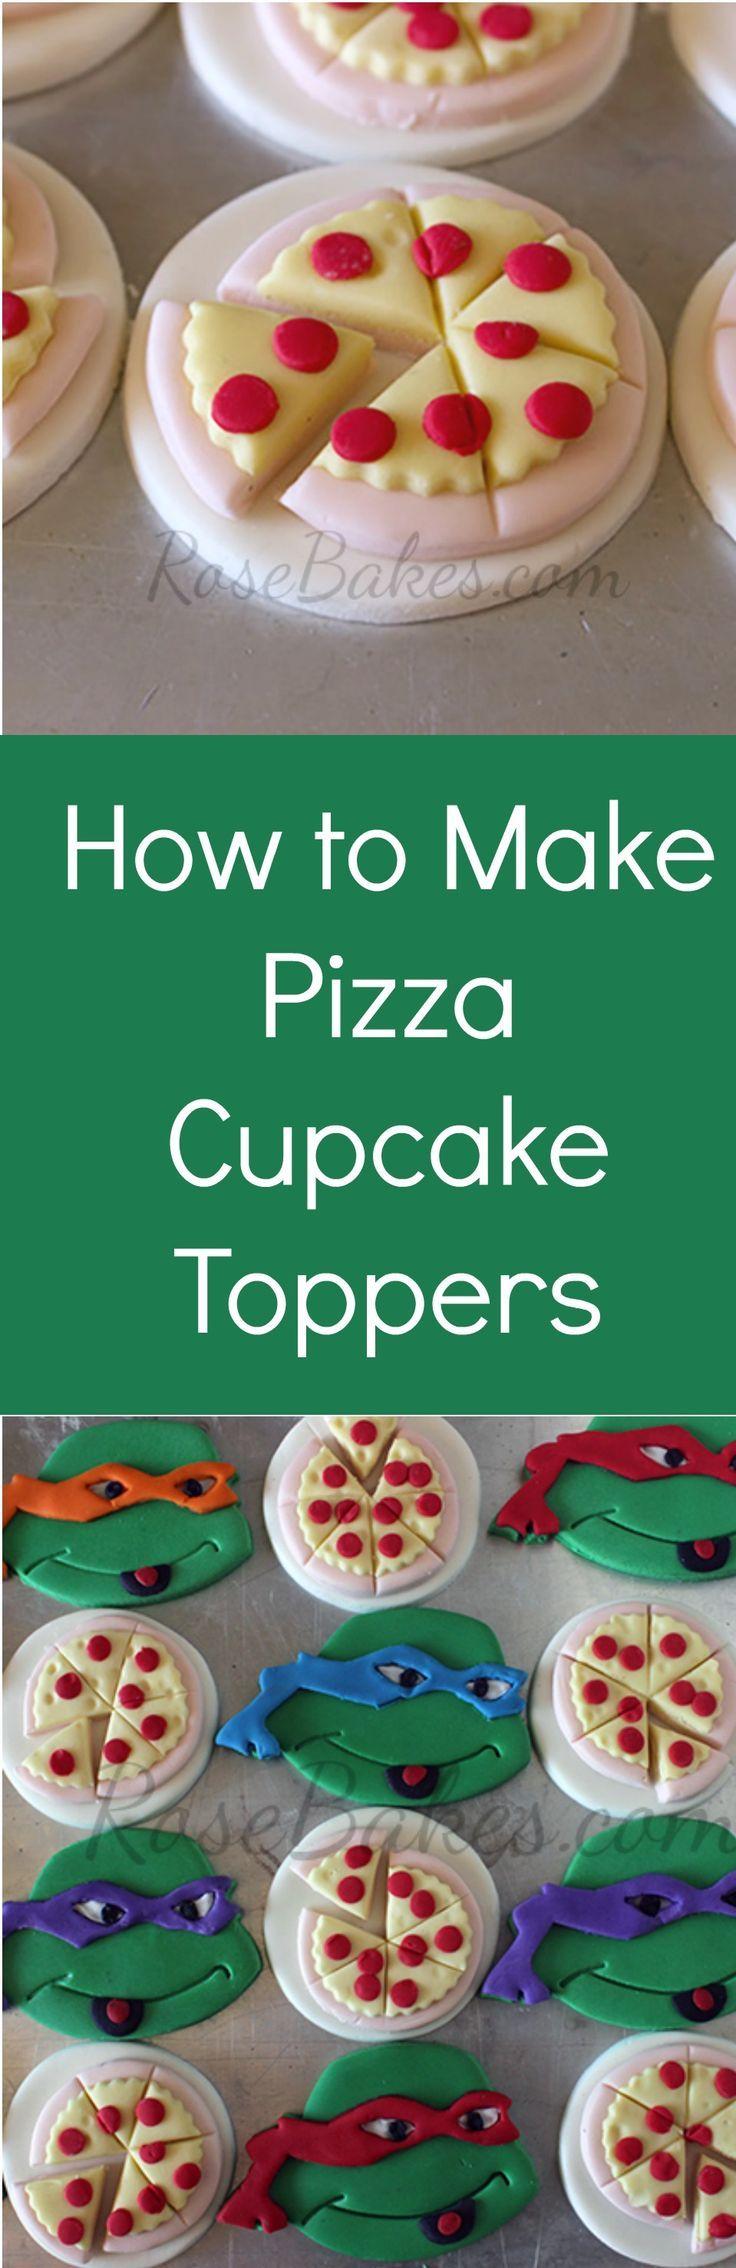 How to Make Teenage Mutant Ninja Turtles Pizza Cupcake Toppers #TMNT